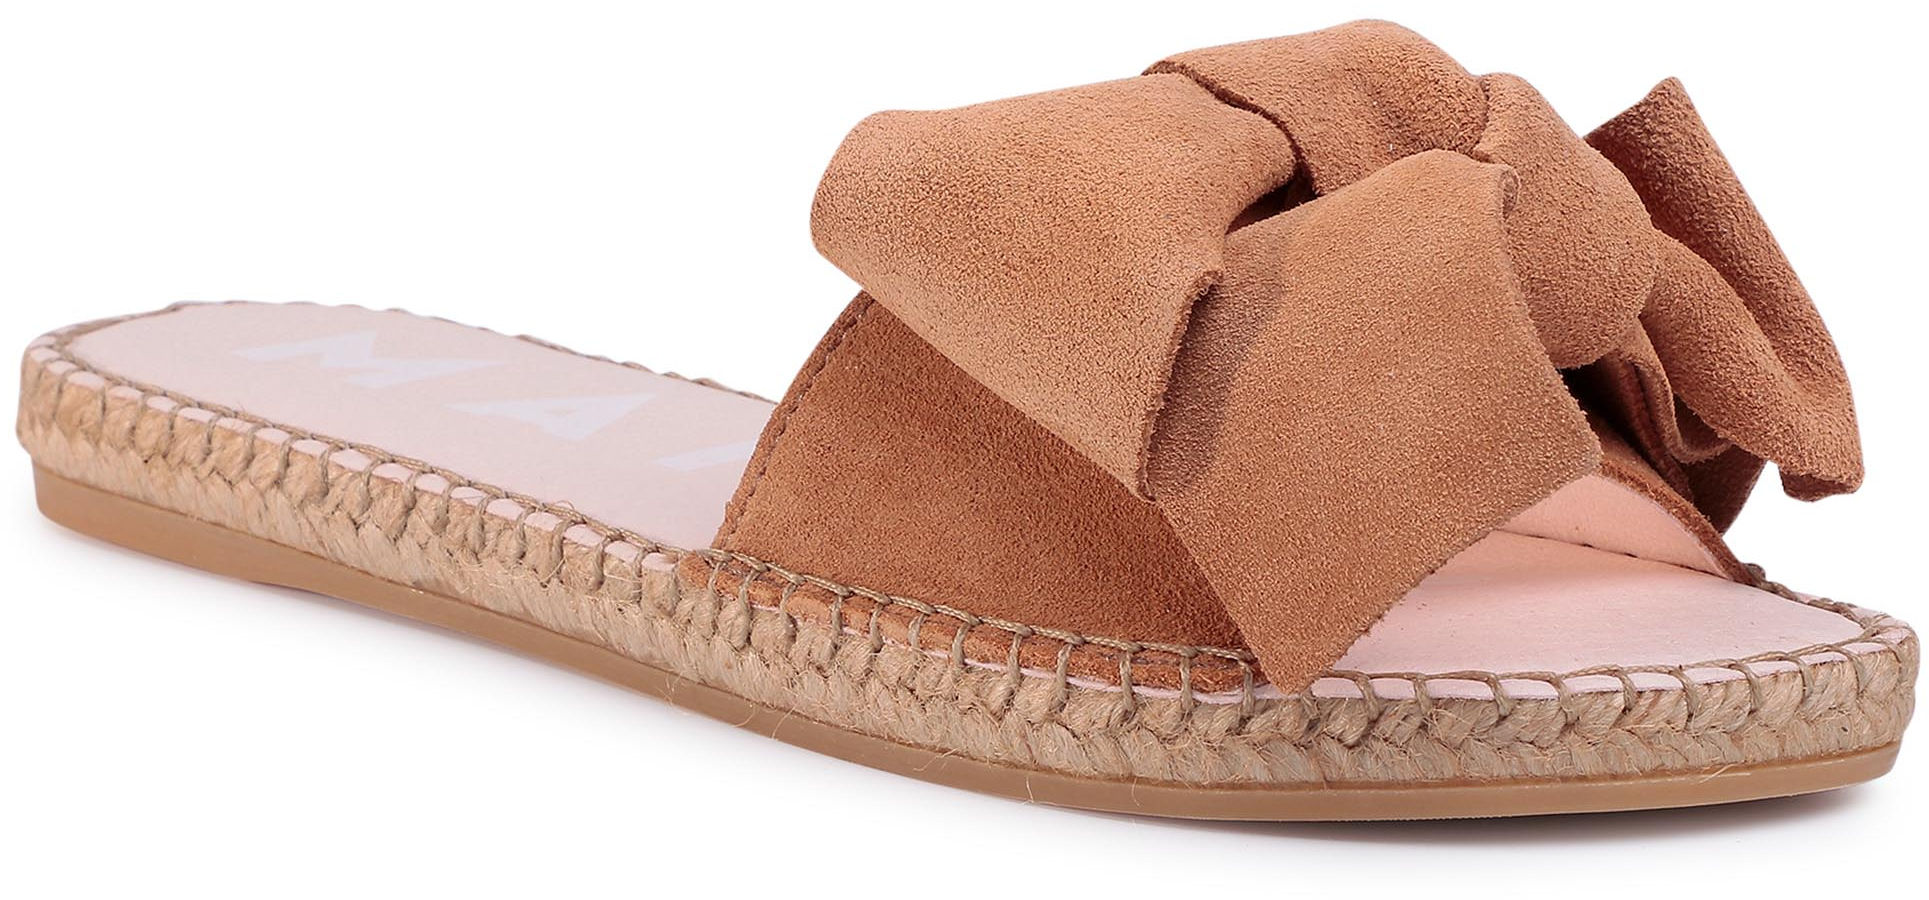 Espadryle MANEBI - Sandals With Bow W 1.1 J0 Cuero